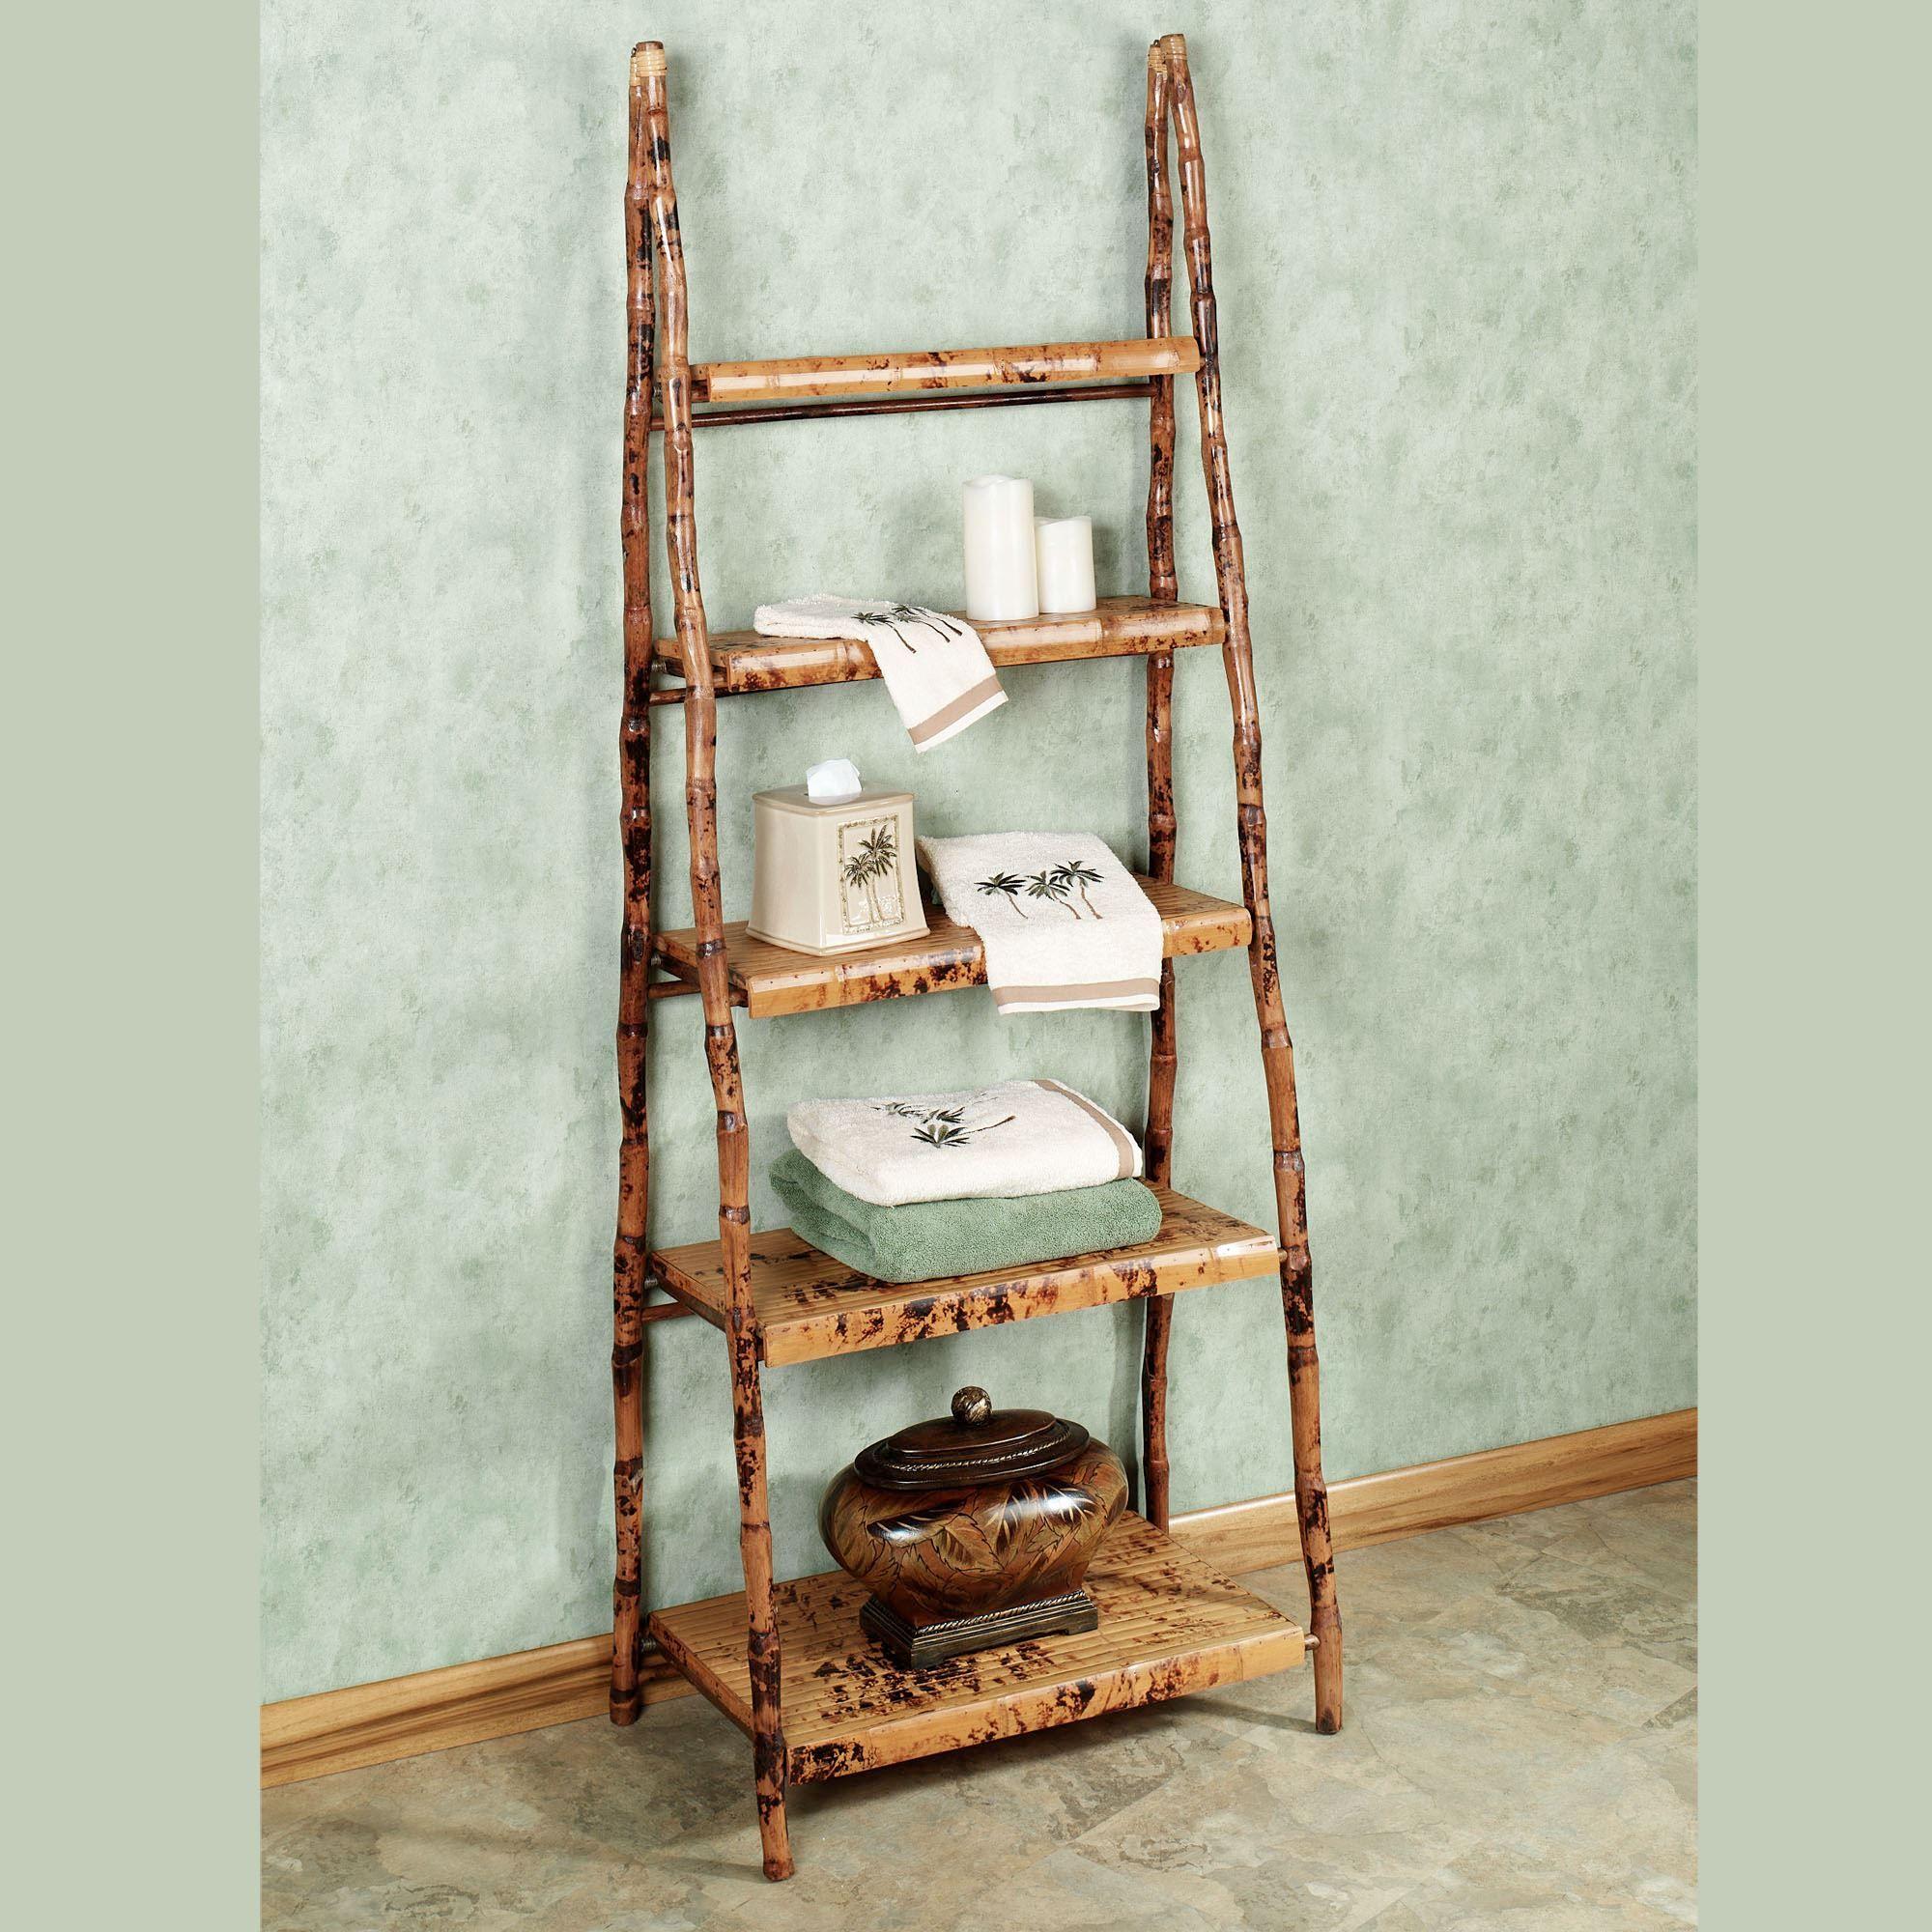 new arrivals 5874a 7ed22 Bocca Ladder Display Shelf